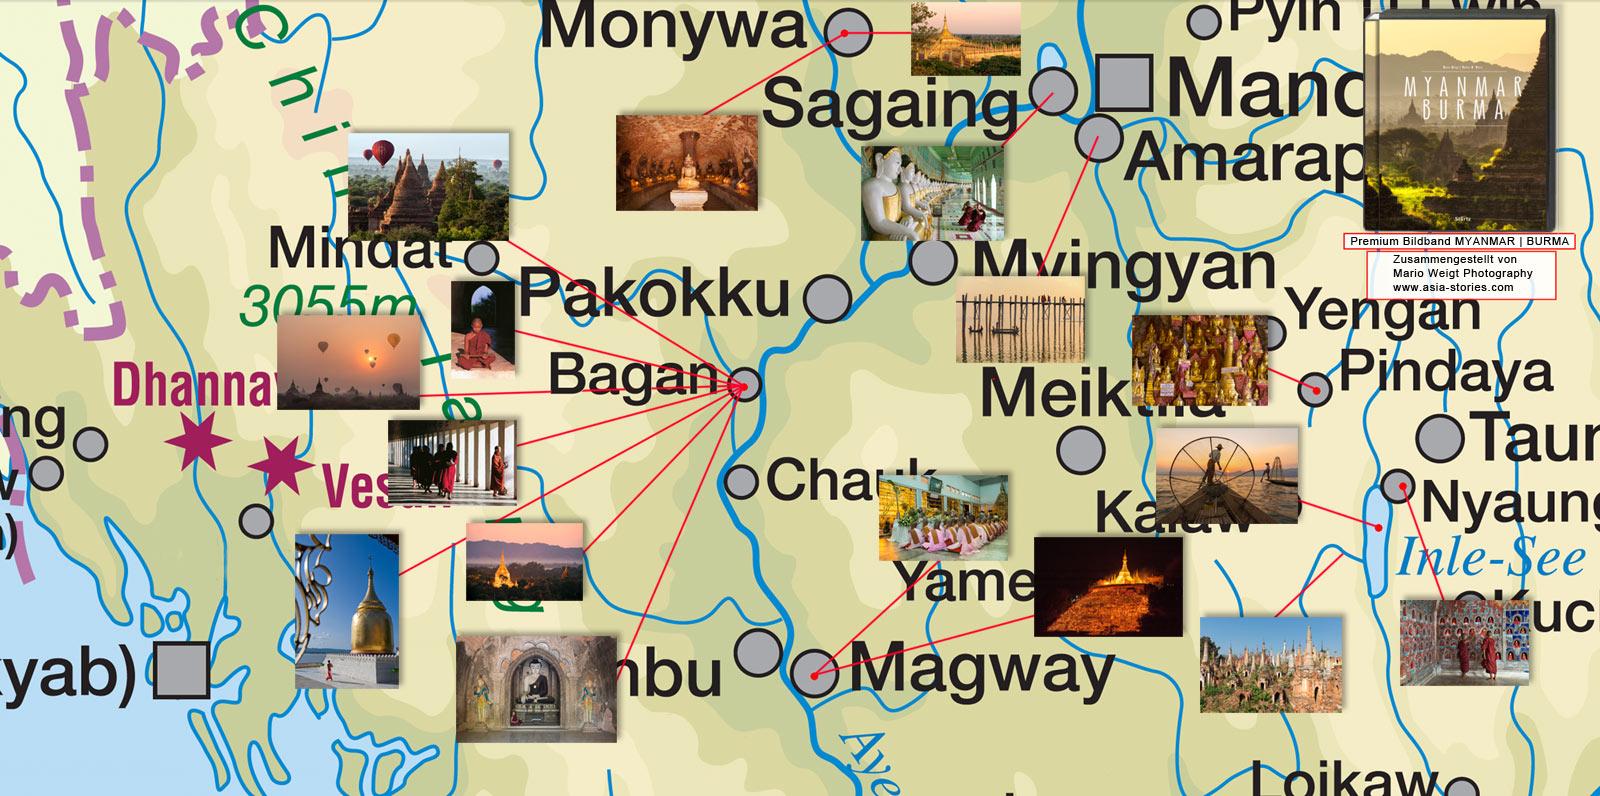 Karte Myanmar.Neu Landkarte Orte Myanmar Burma Mit Fotos Myanmar Reisetipps